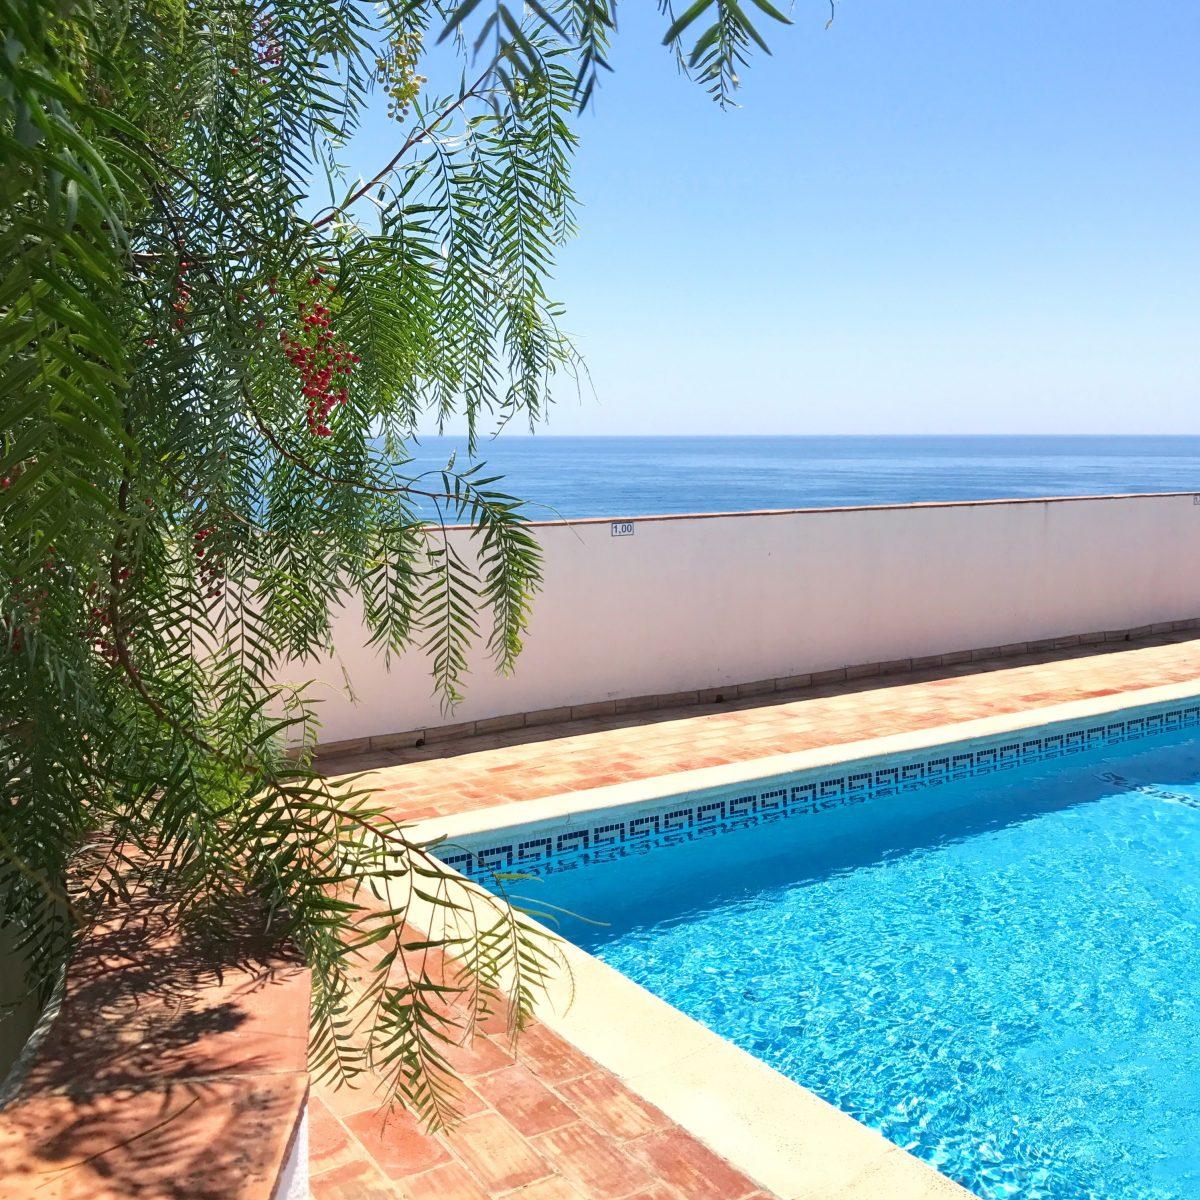 Ferien an der Algarve | berlinmittemom.com